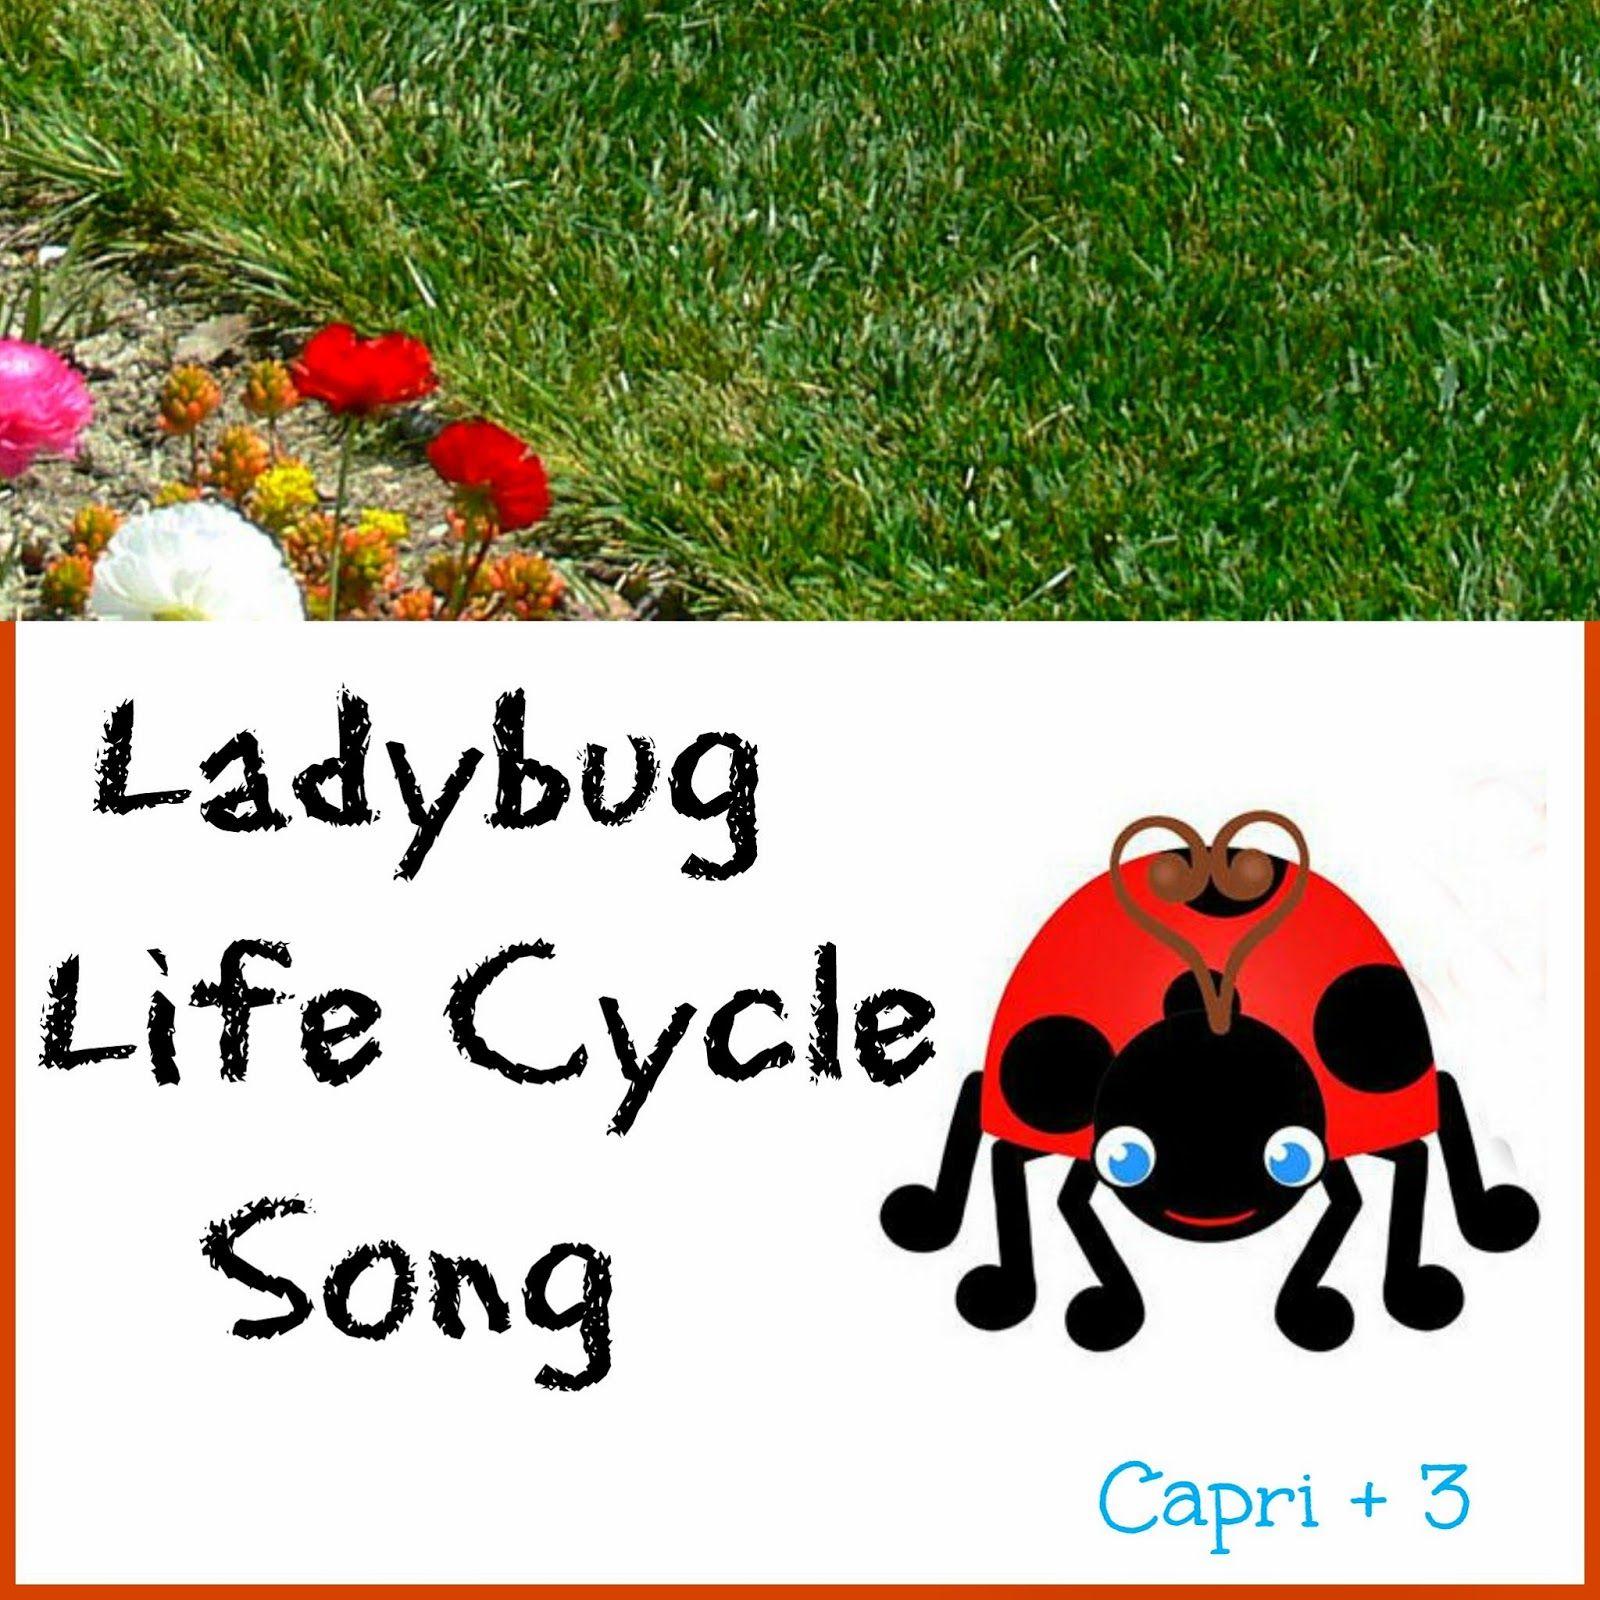 Capri 3 Ladybug Life Cycle Song